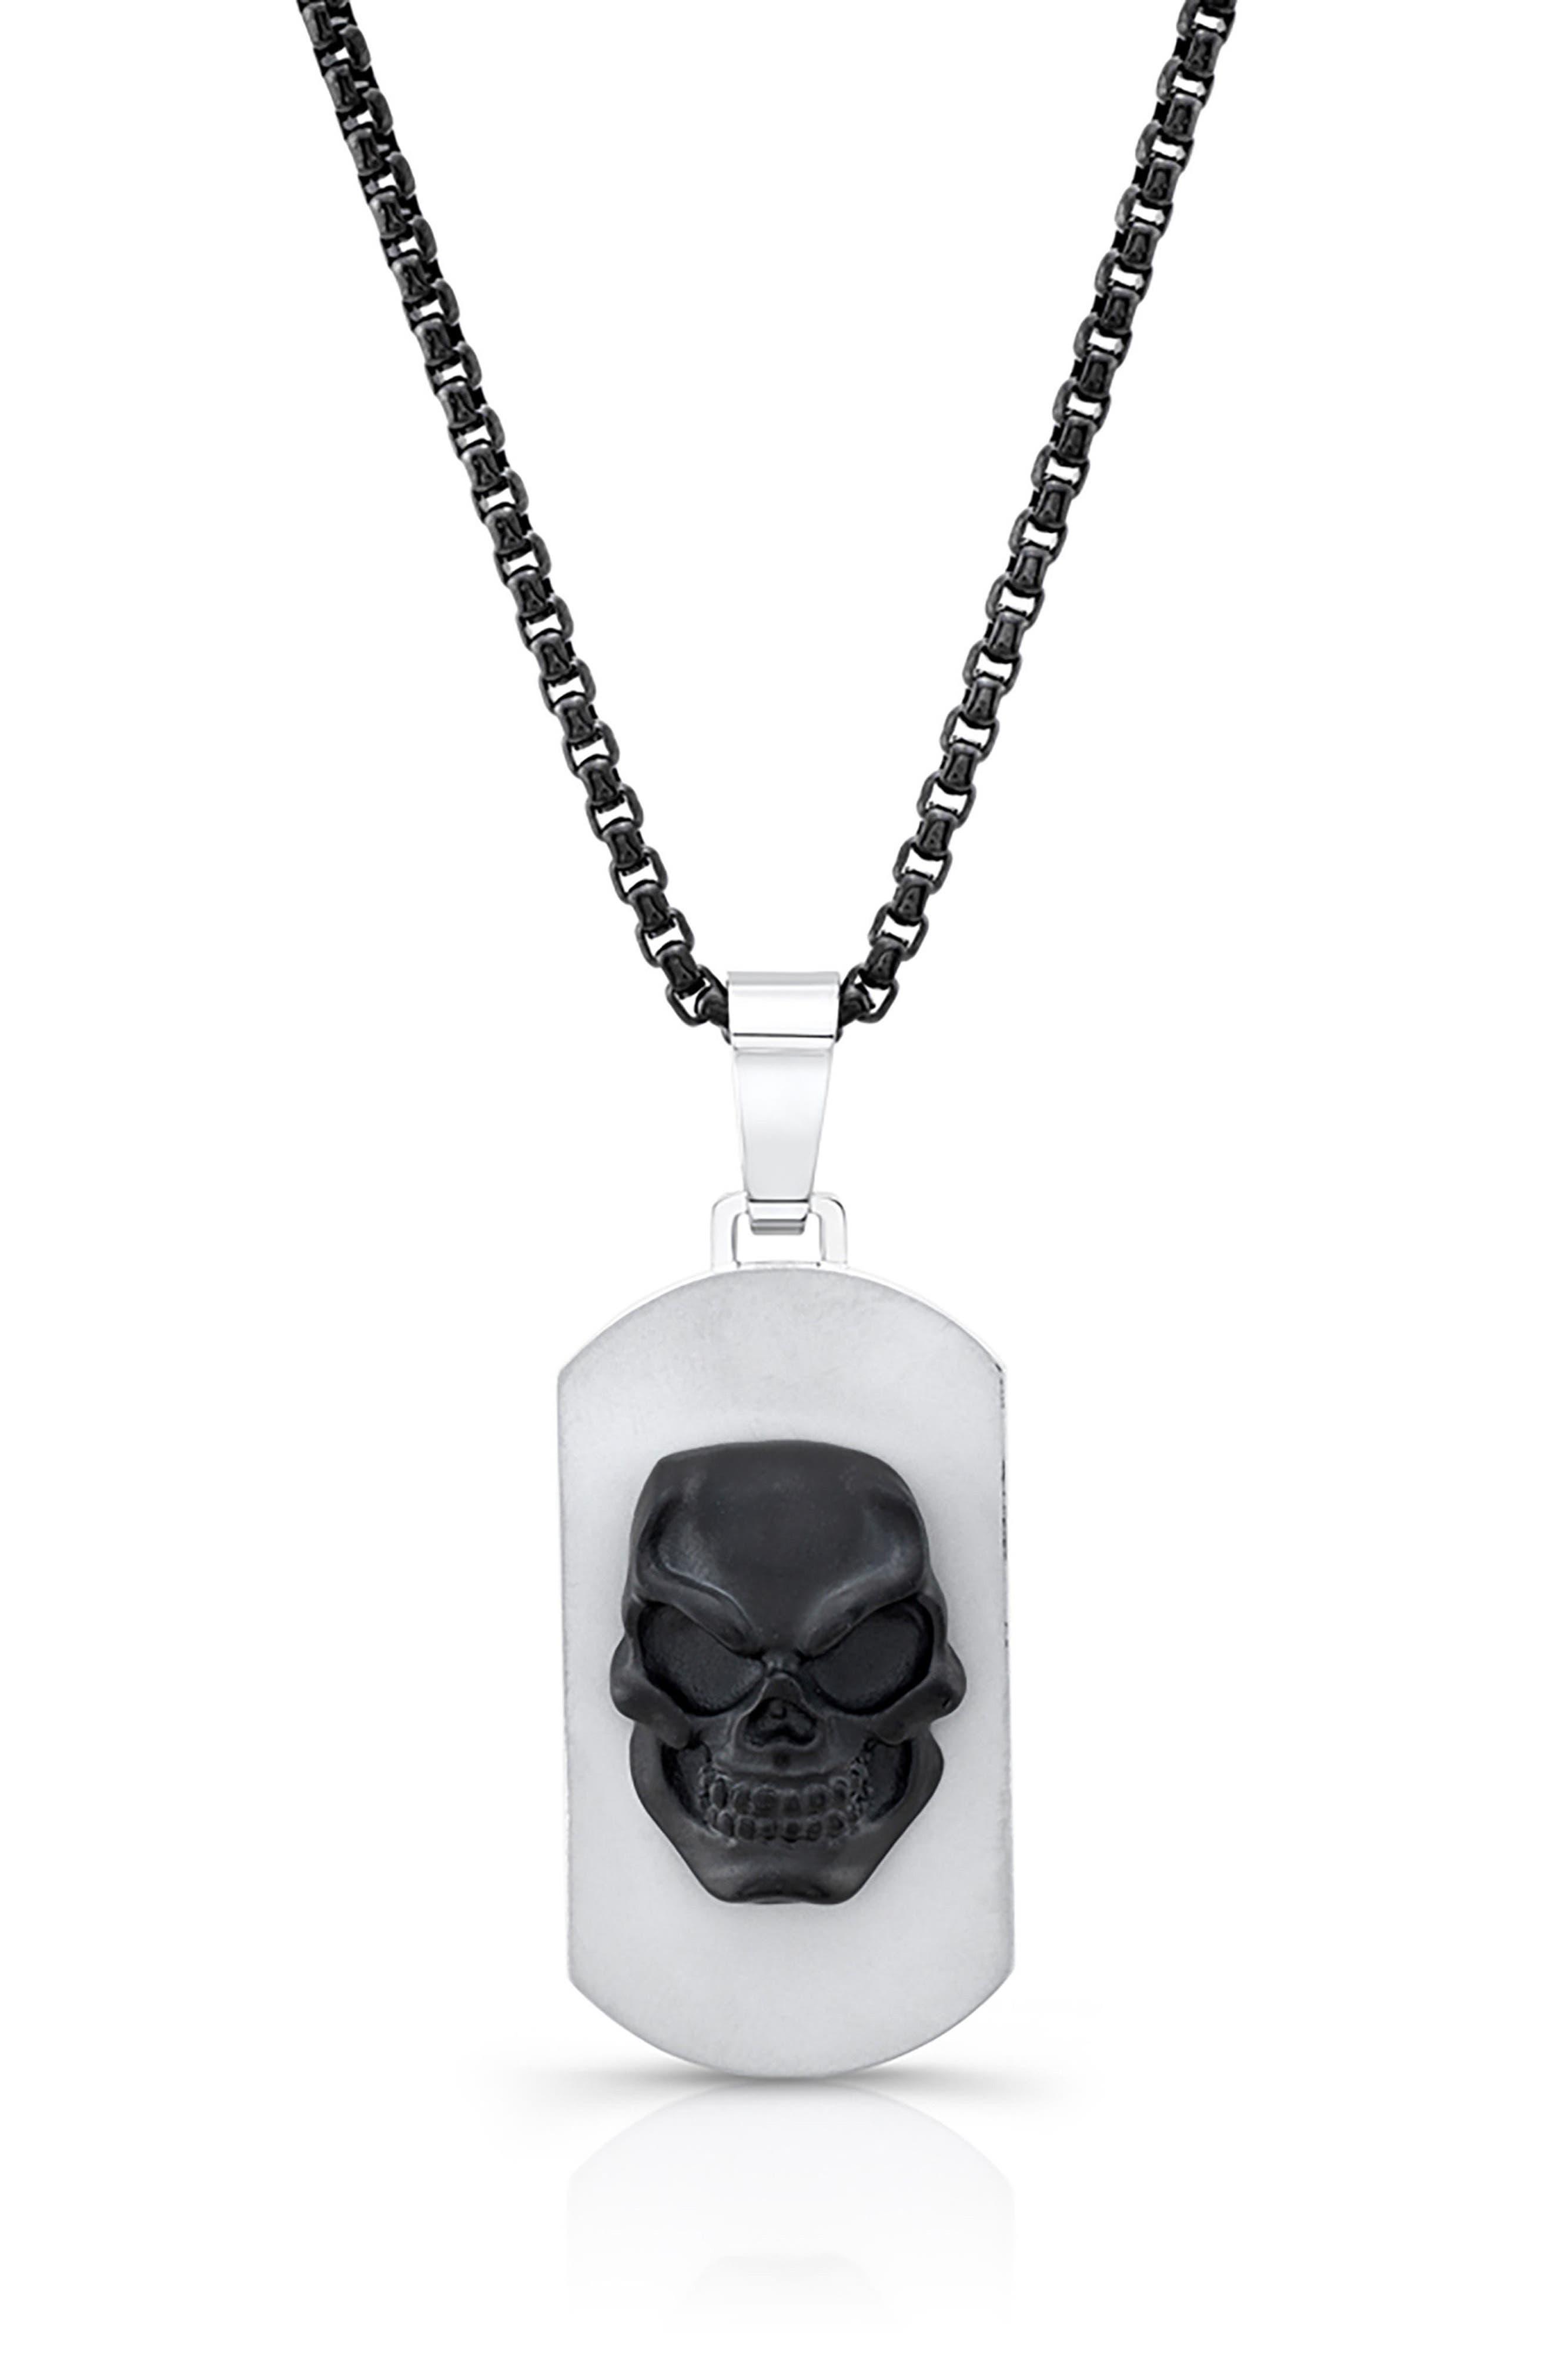 Skull Dog Tag Necklace,                         Main,                         color, Black/ Silver